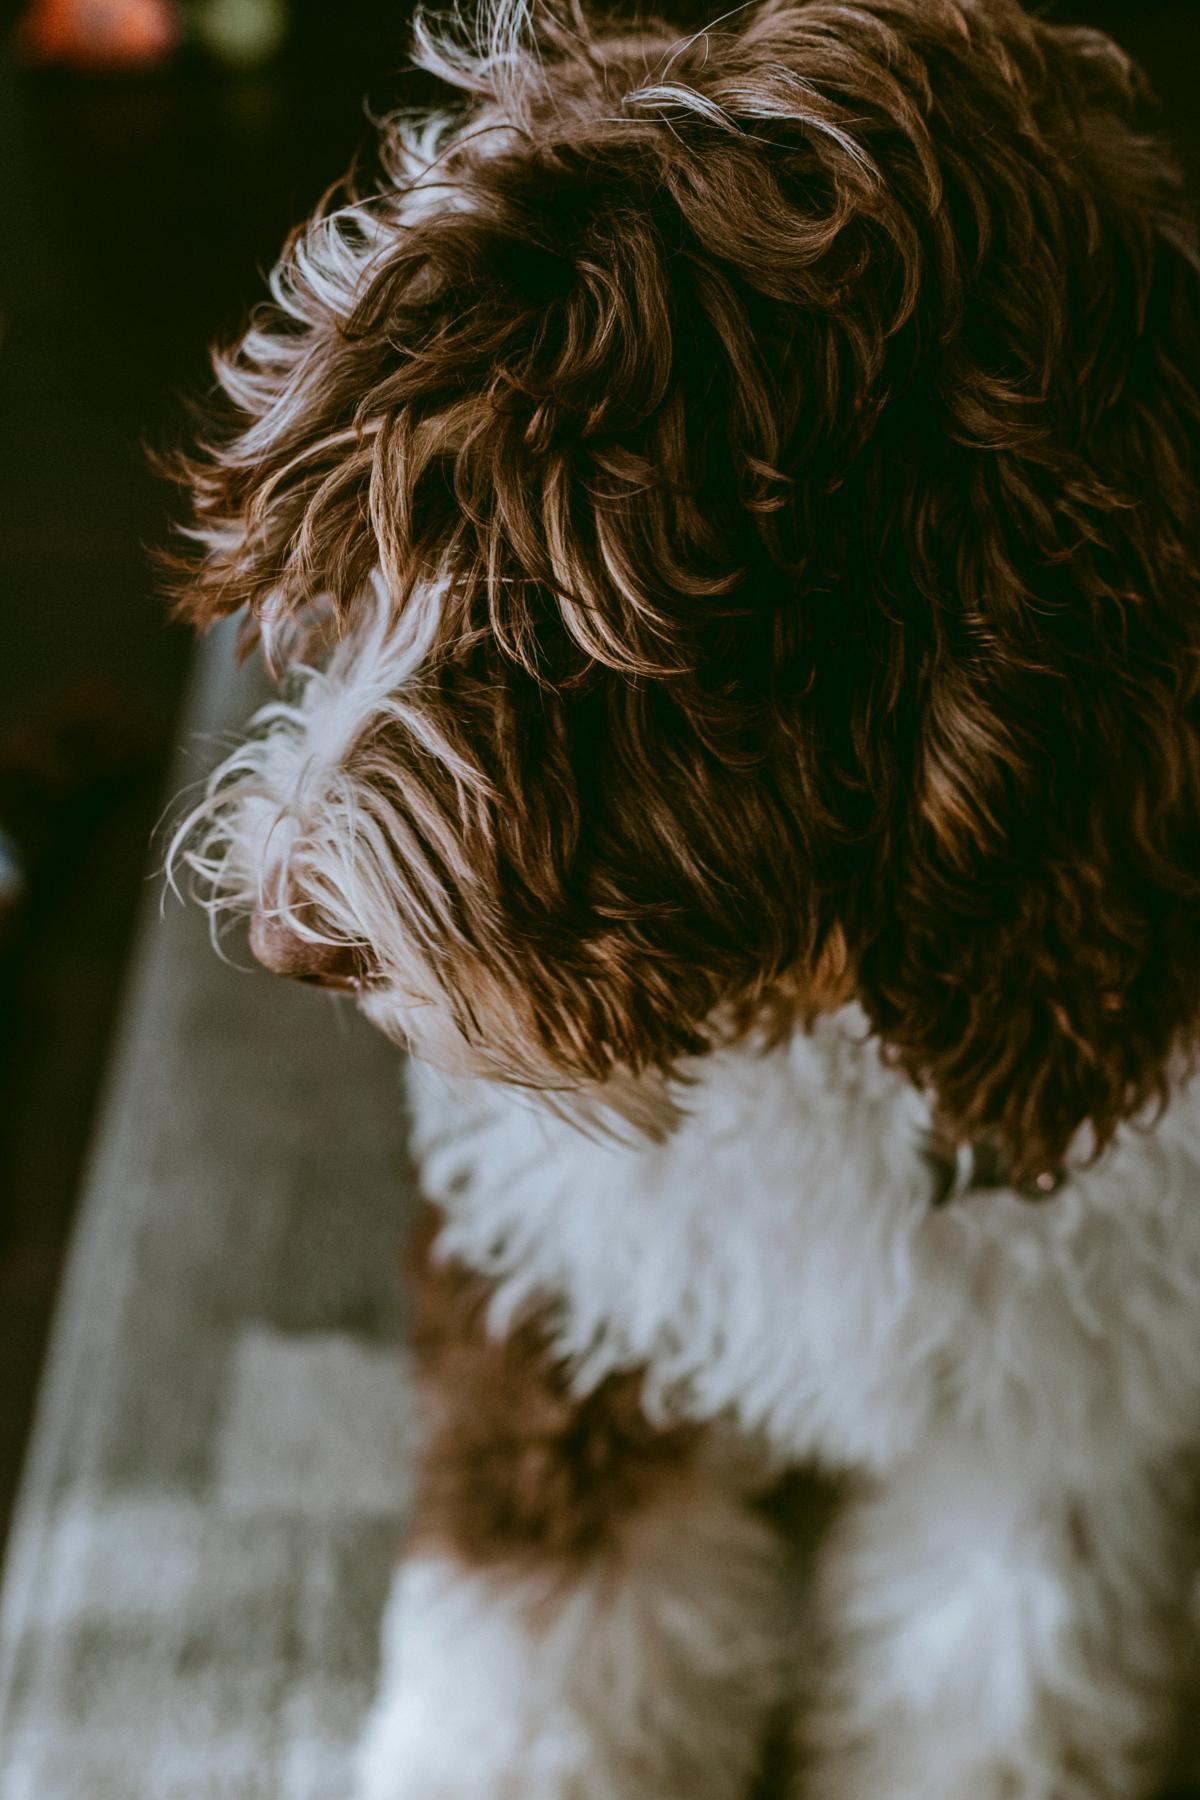 Dog Terrier Hair #420970